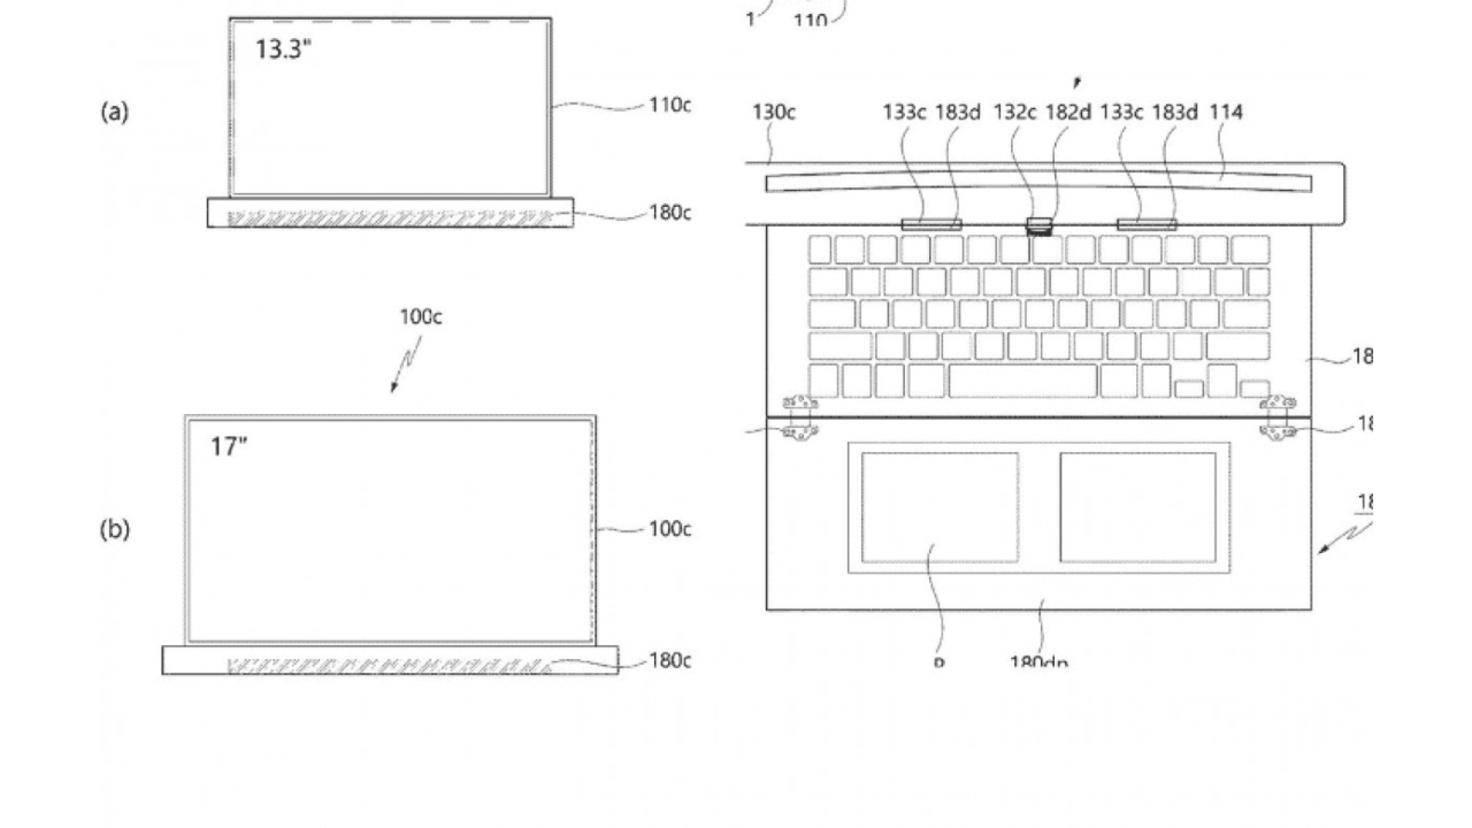 LG rollbares Laptop-Display